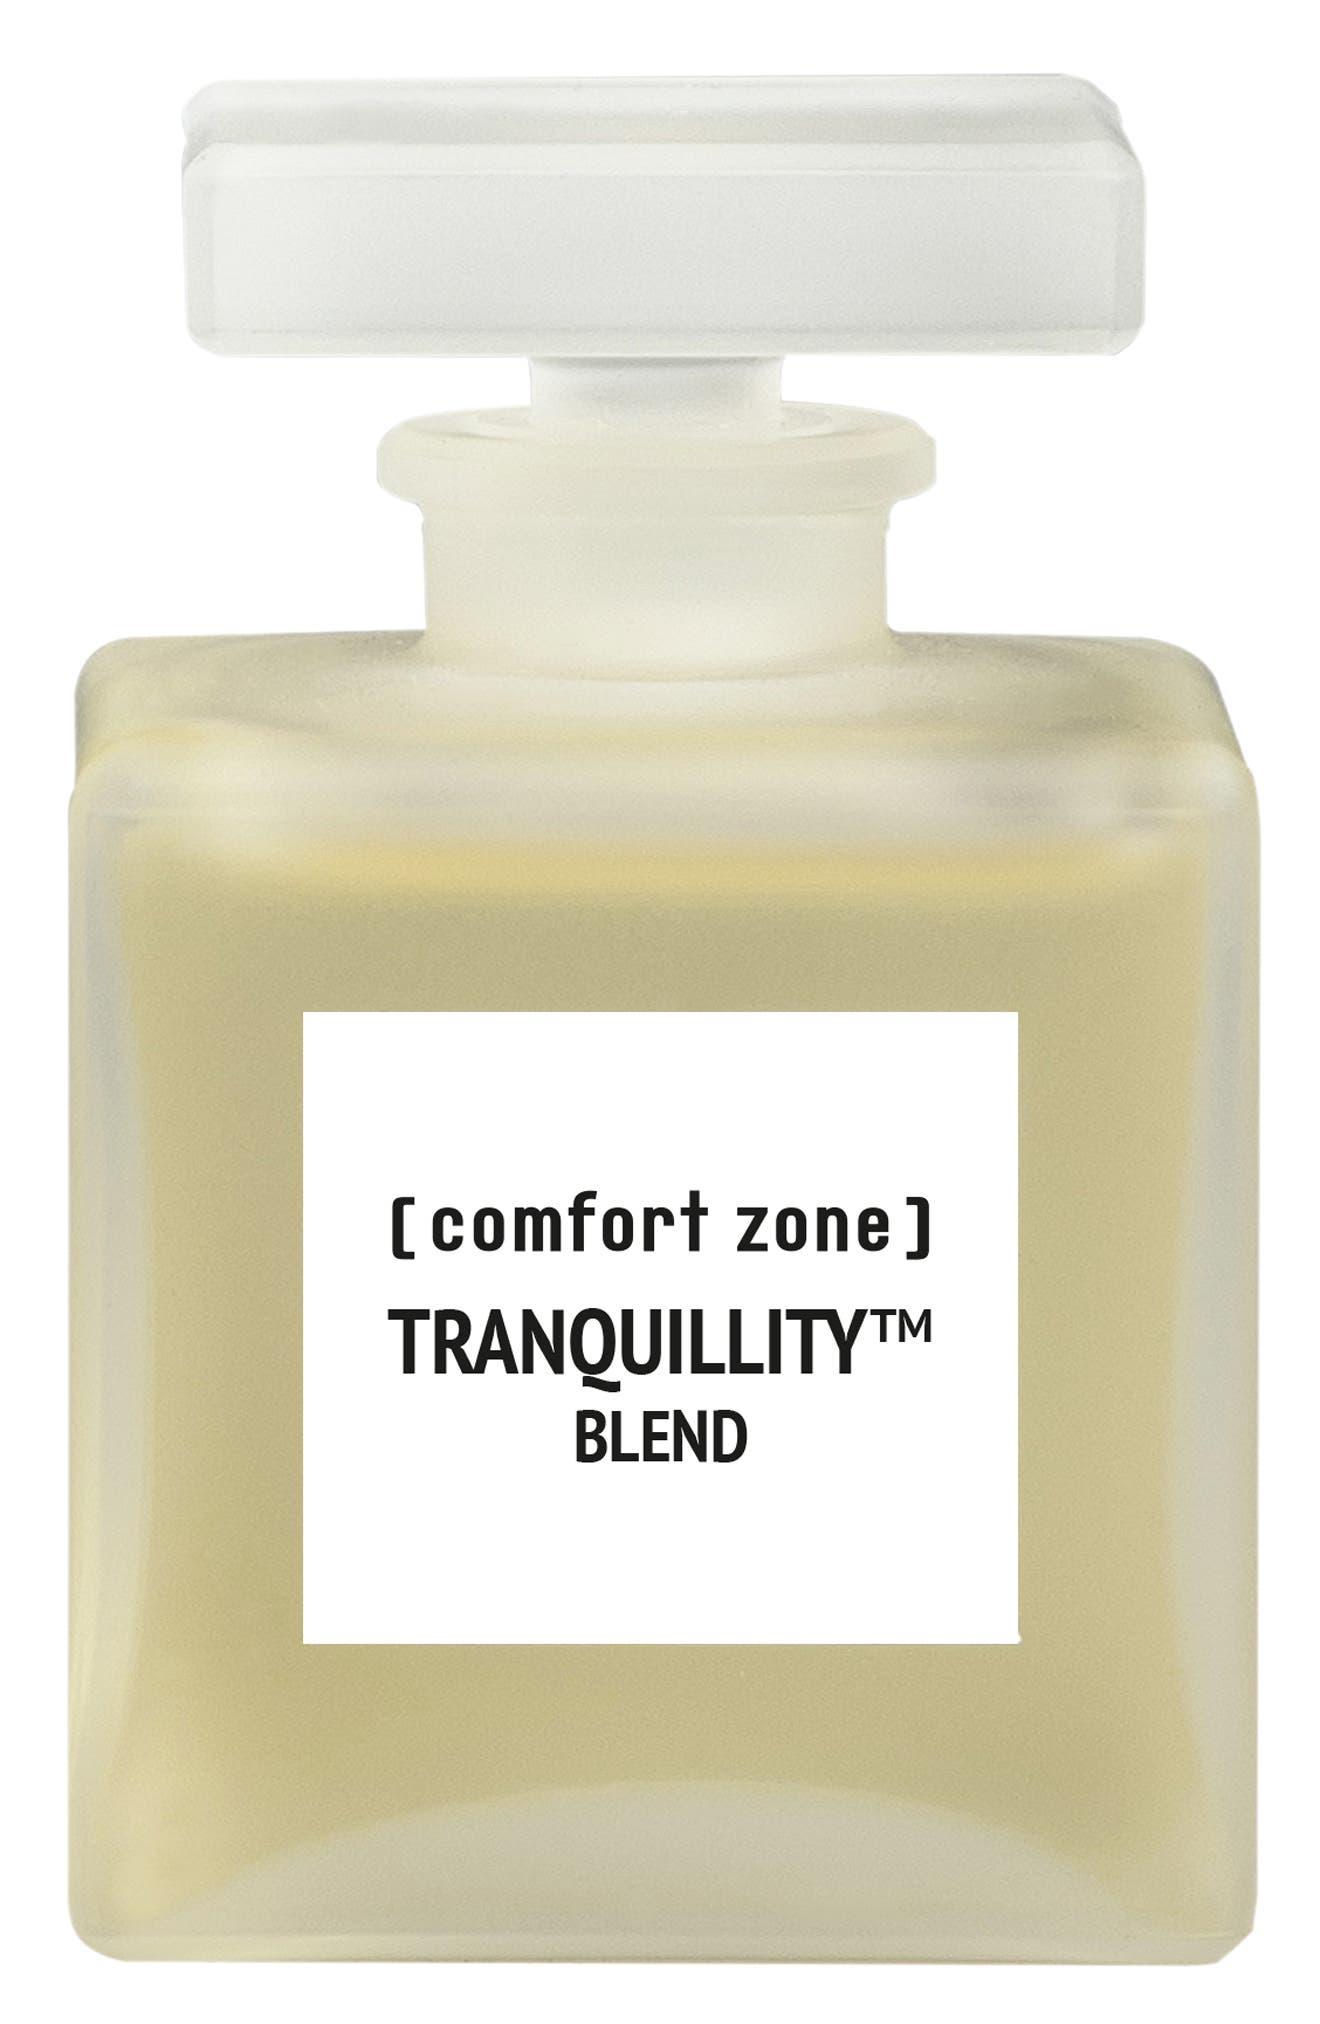 Tranquillity(TM) Blend Fragrance